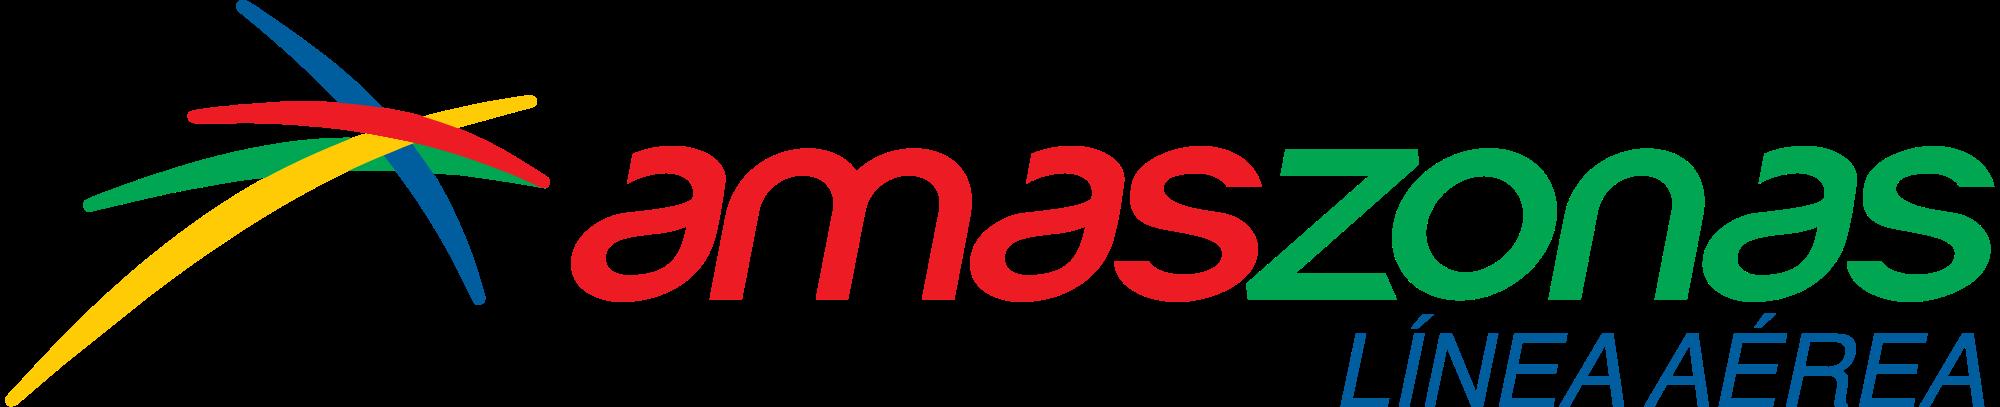 Amaszonas_Linea_Aerea_Logo.svg.png